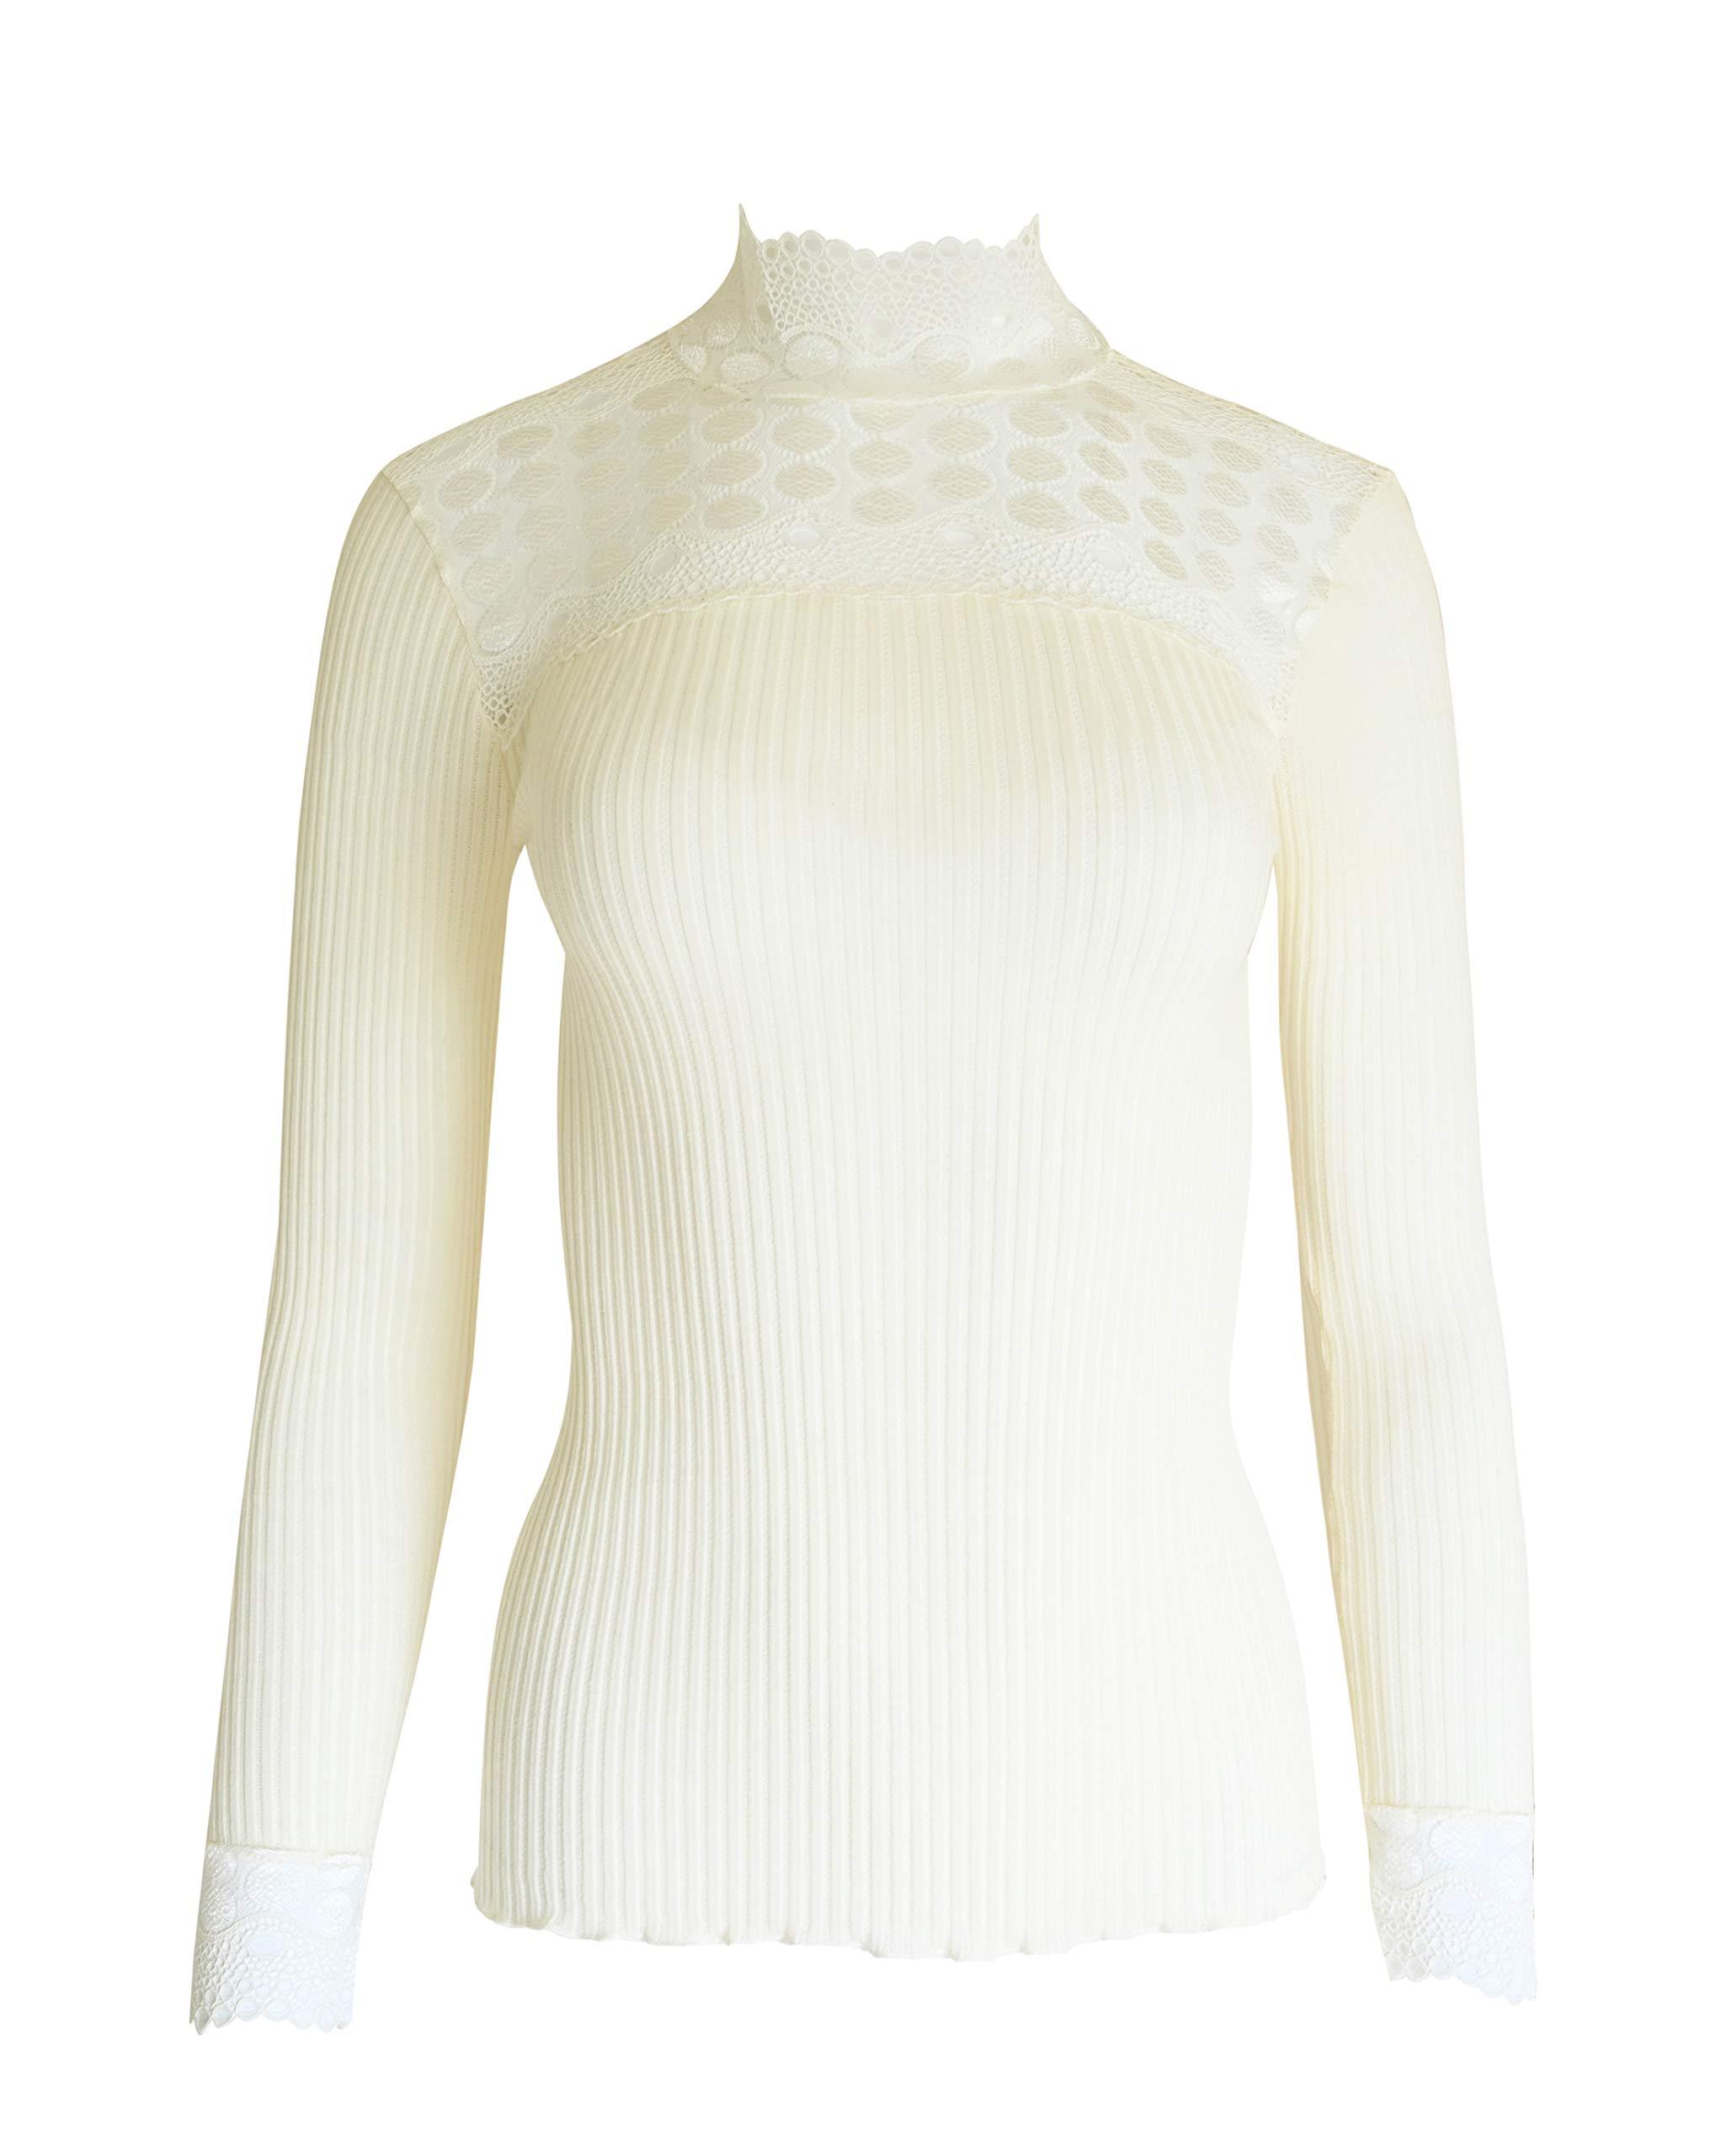 Yidartonの女性のキュートなツイストラウンドネックプルオーバー長袖シャツ暖かいニット。イタリア製。